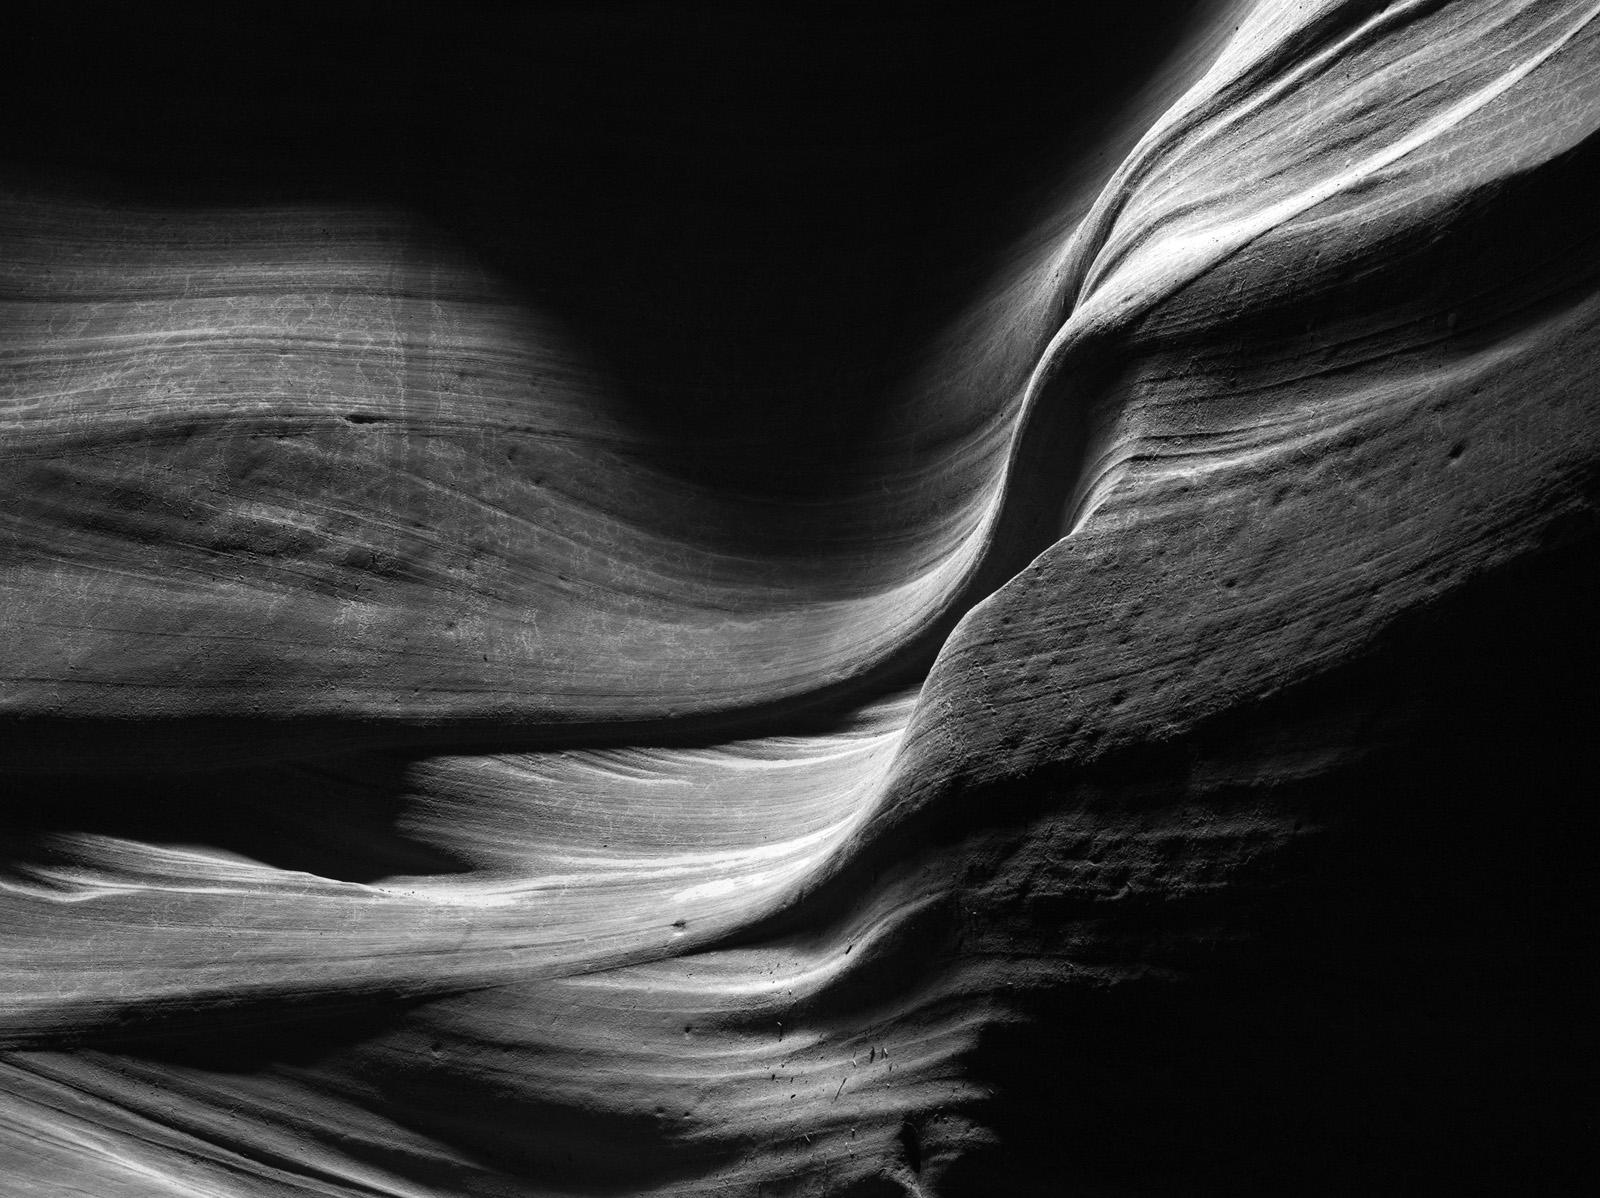 ©Wei-Ming Yuan, Breeze, 2013, Courtesy KLV Art Projects